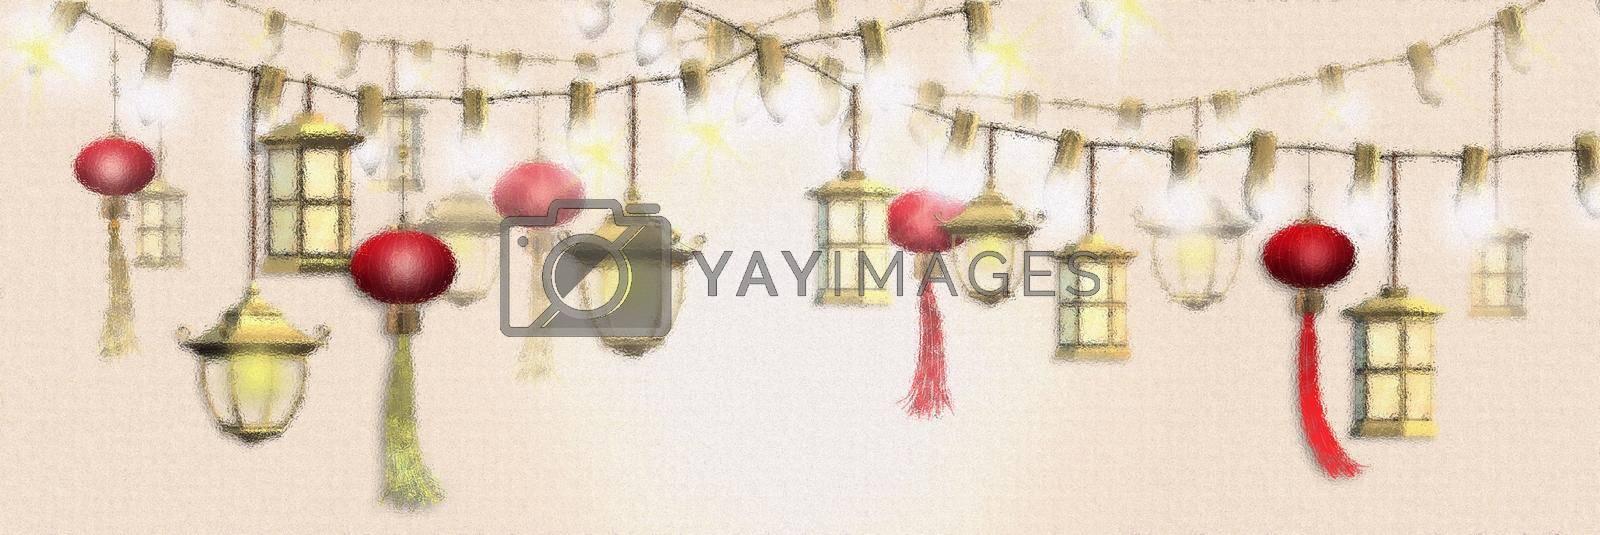 Chinese Lantern festival, new year, mid autumn decoration background with lanterns on yellow background. Soft focus design. Horizontal Header. 3D rendering illustration